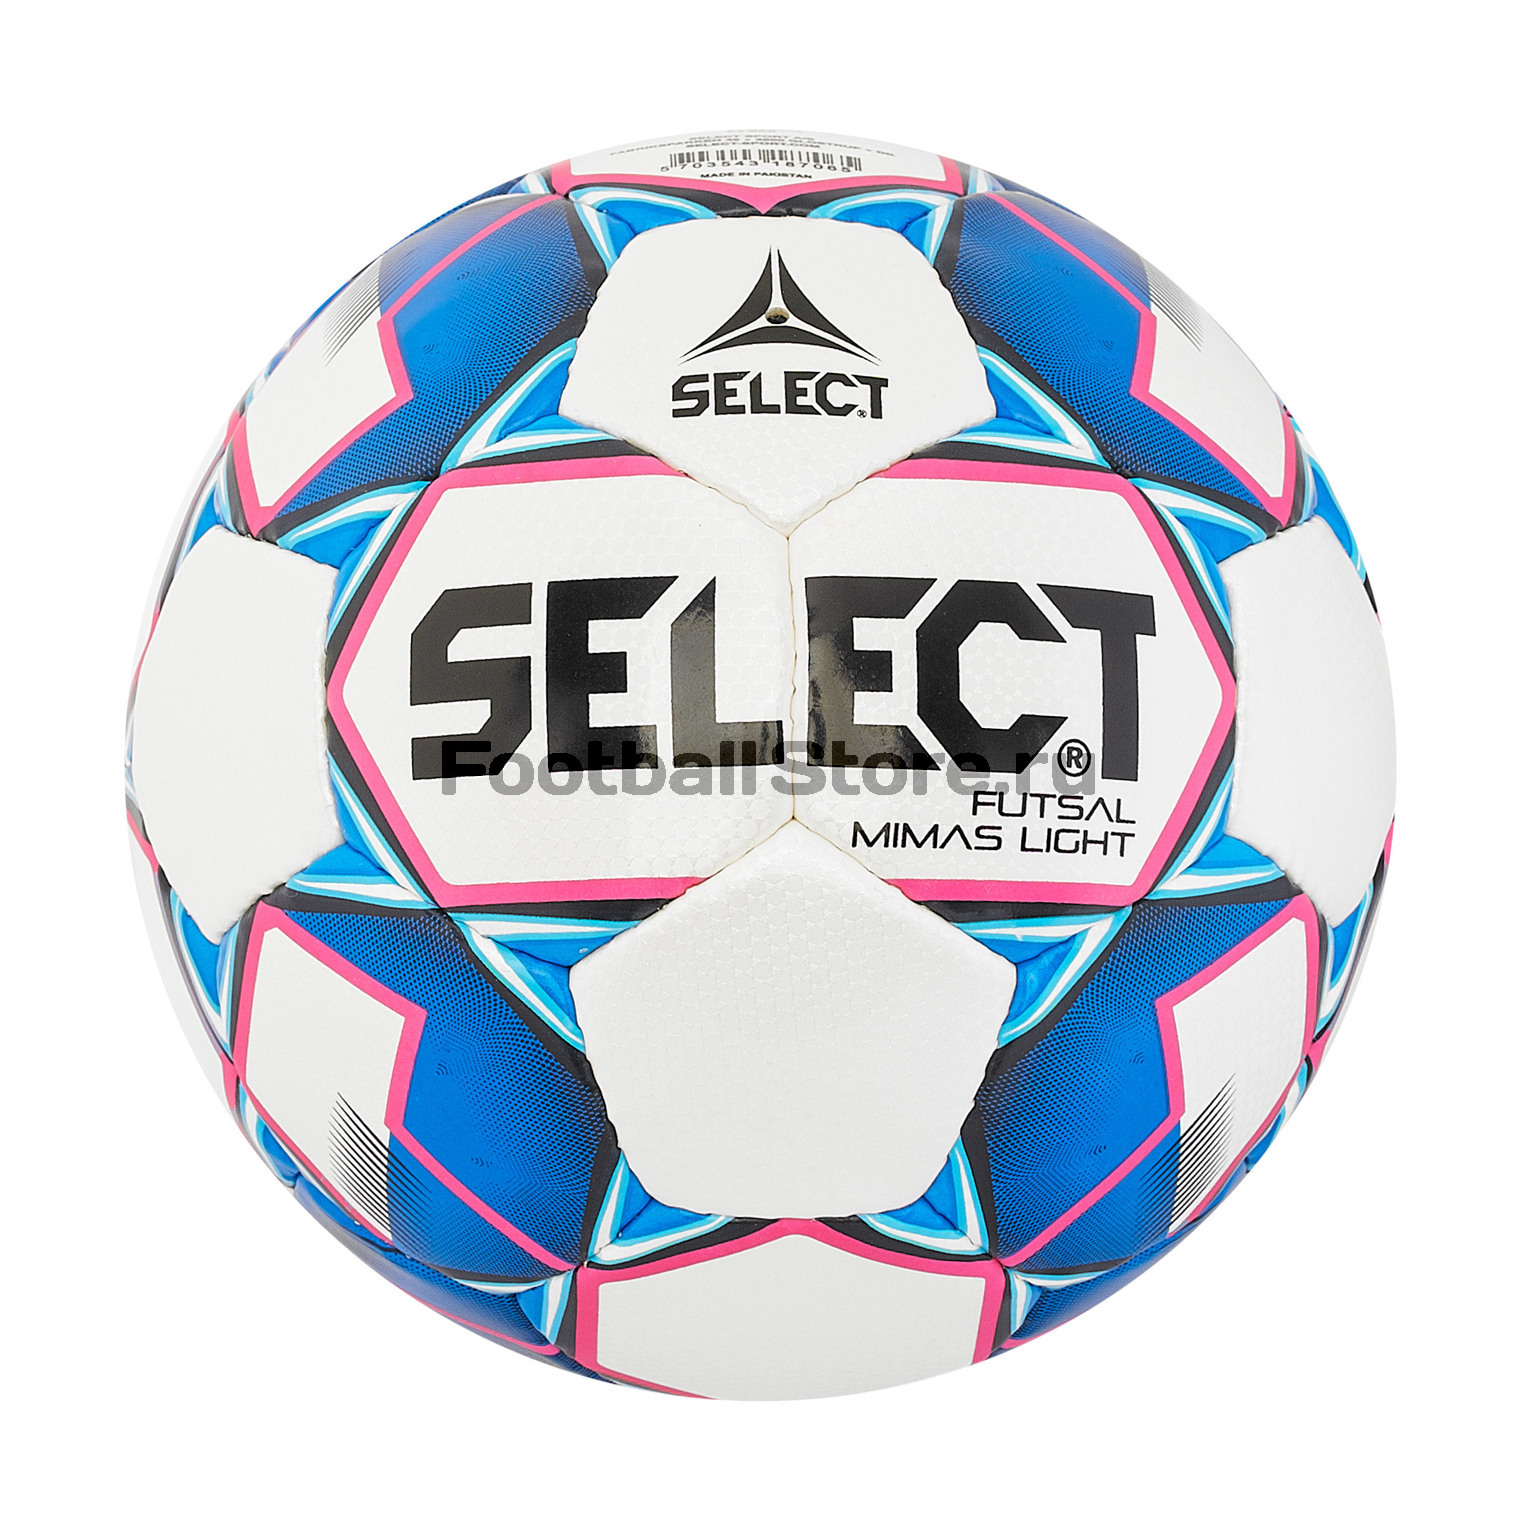 Футзальный мяч Select Futsal Mimas Light 852613-020 мяч футзальный mitre futsal tempest